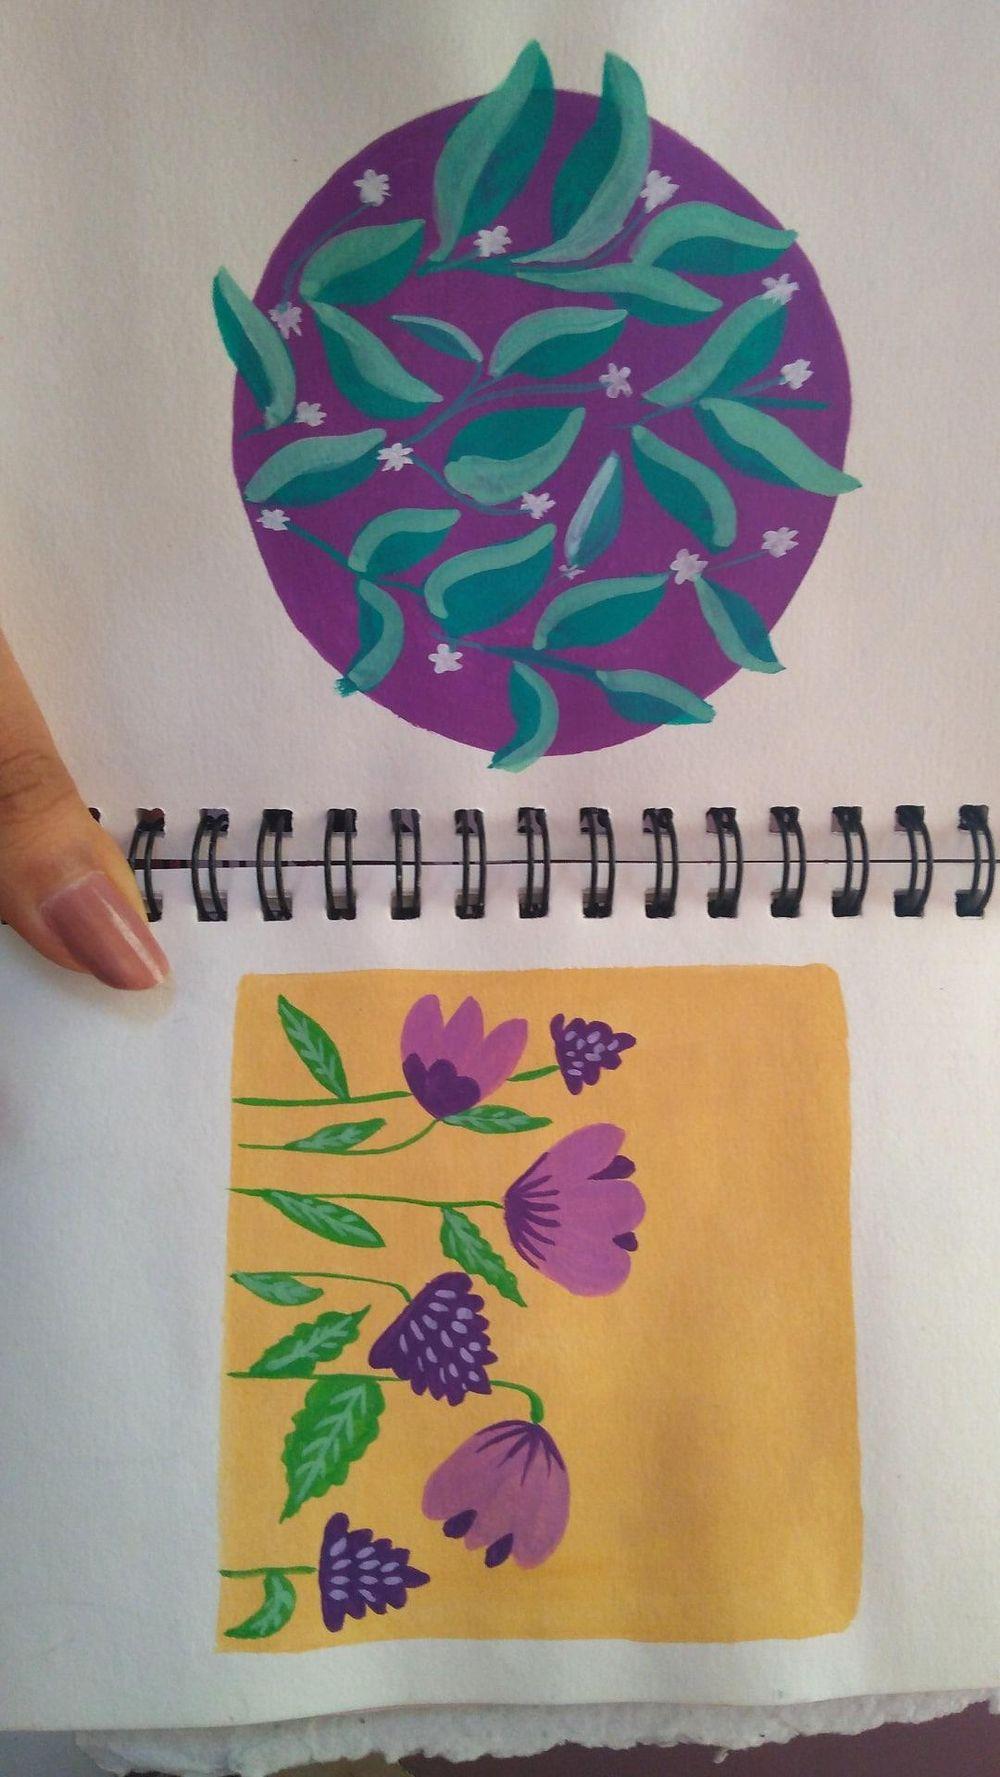 gouache patterns - image 1 - student project